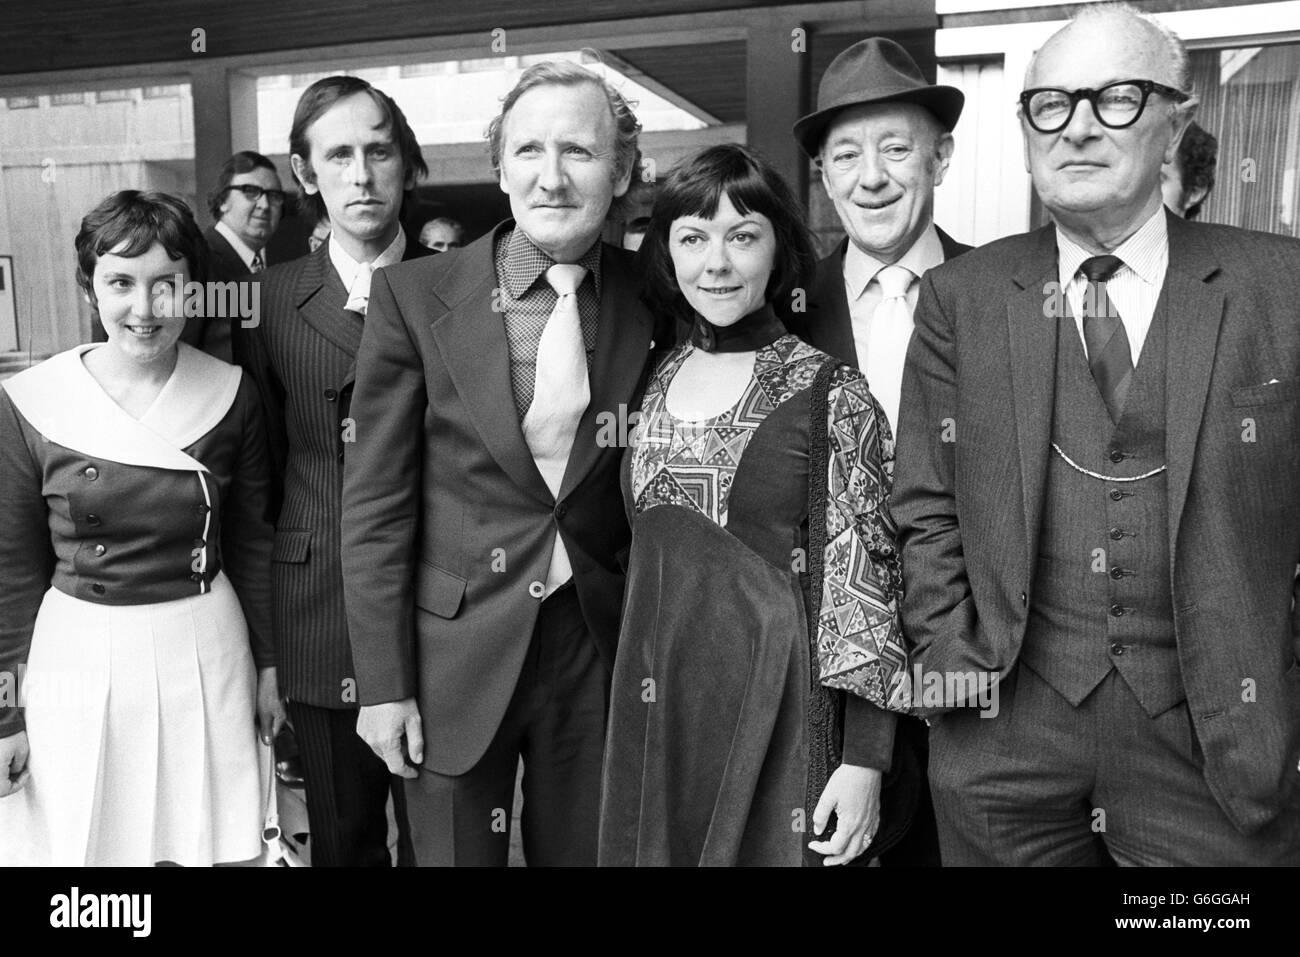 Entertainment - Shaftesbury Theatre Petition - London - Stock Image